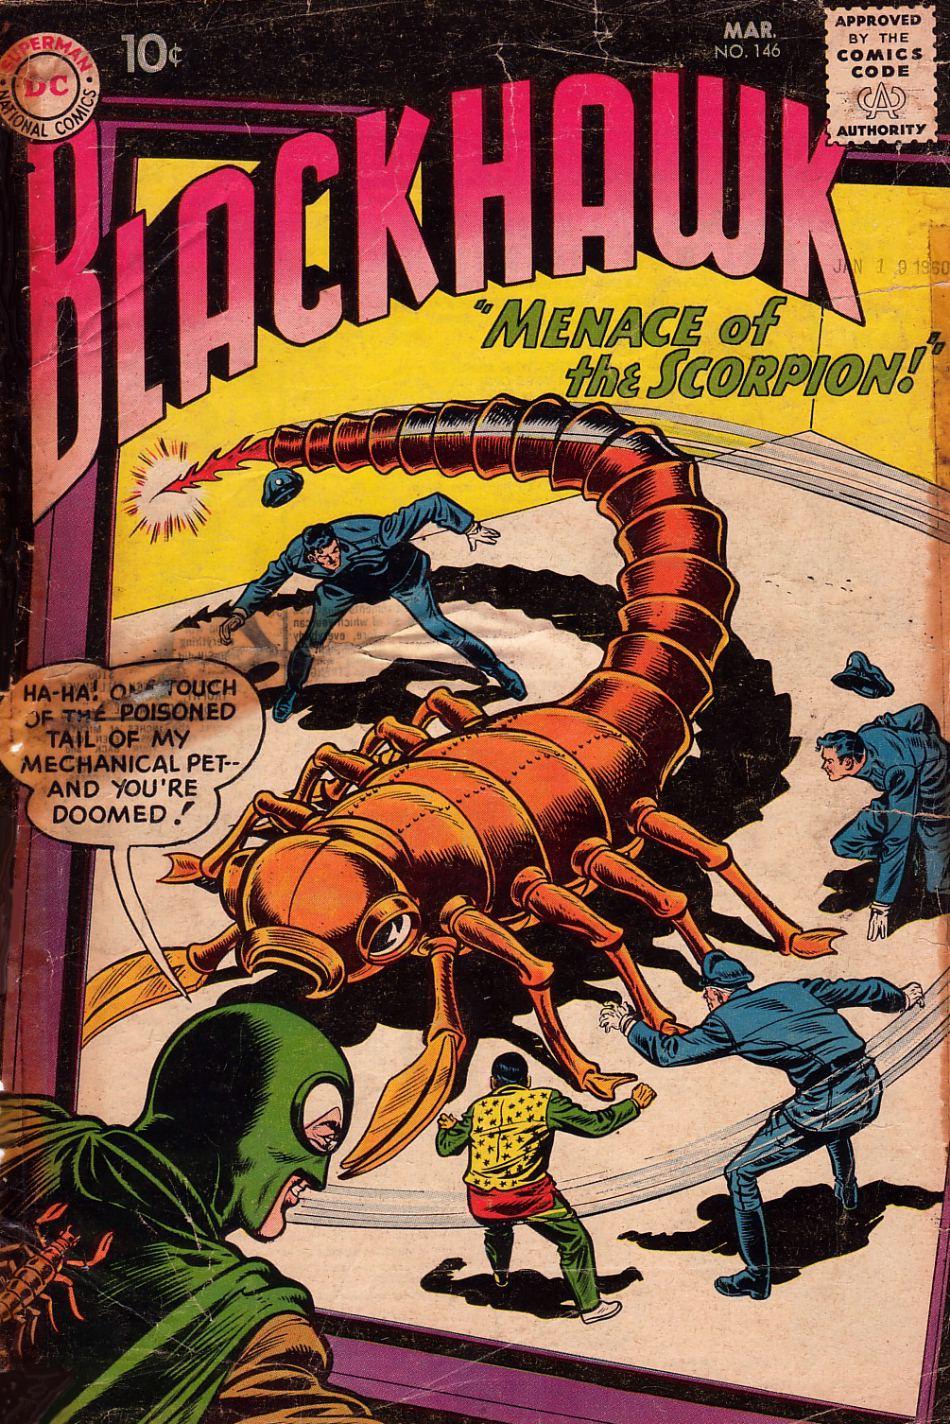 Blackhawk (1957) 146 Page 1